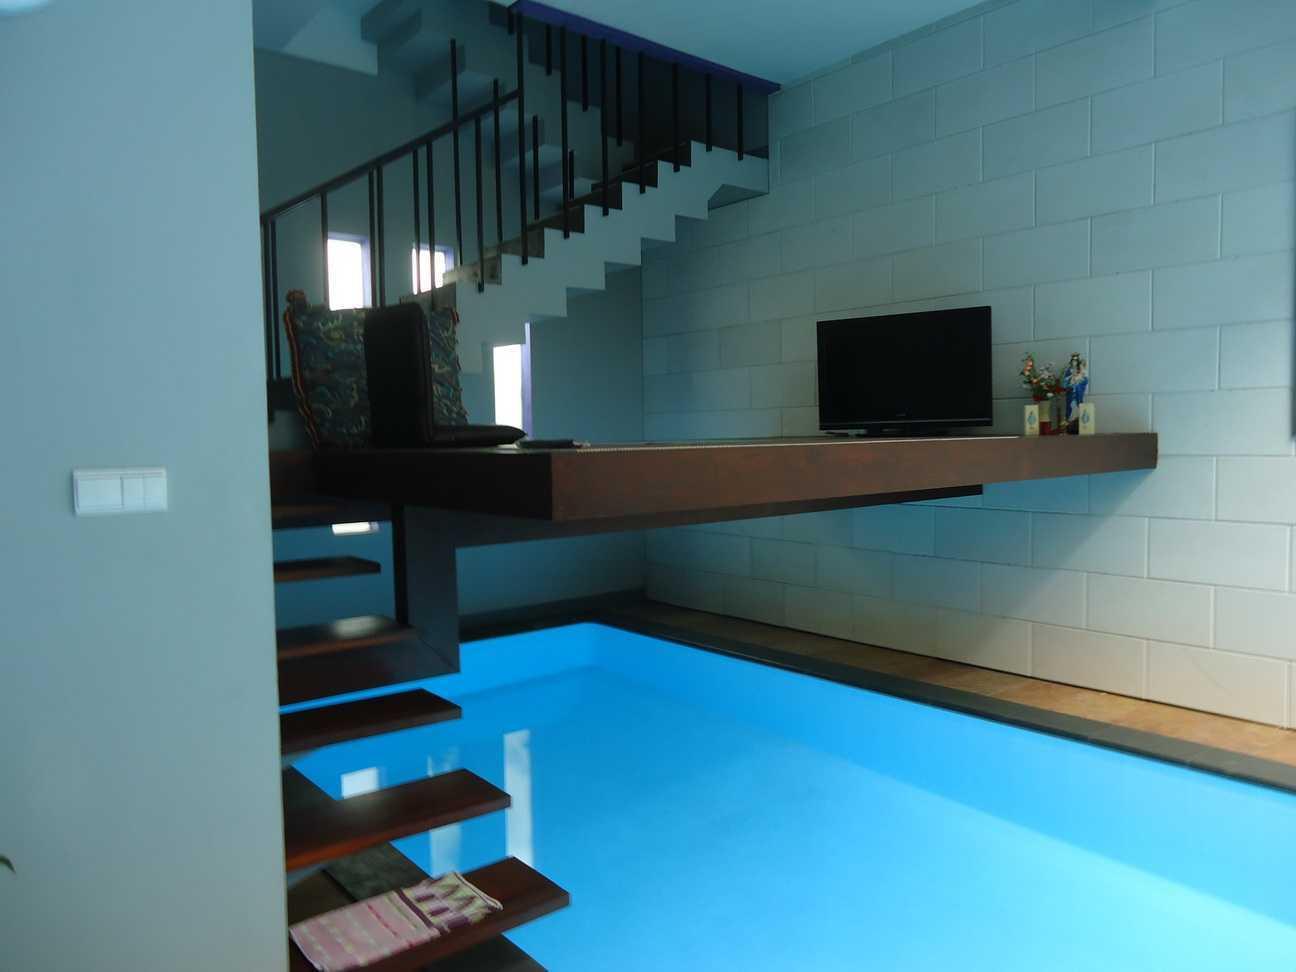 Budi Dharma The Relaxation House Gelong Selatan - Tomang Gelong Selatan - Tomang Gelong-Selatan-07   23856